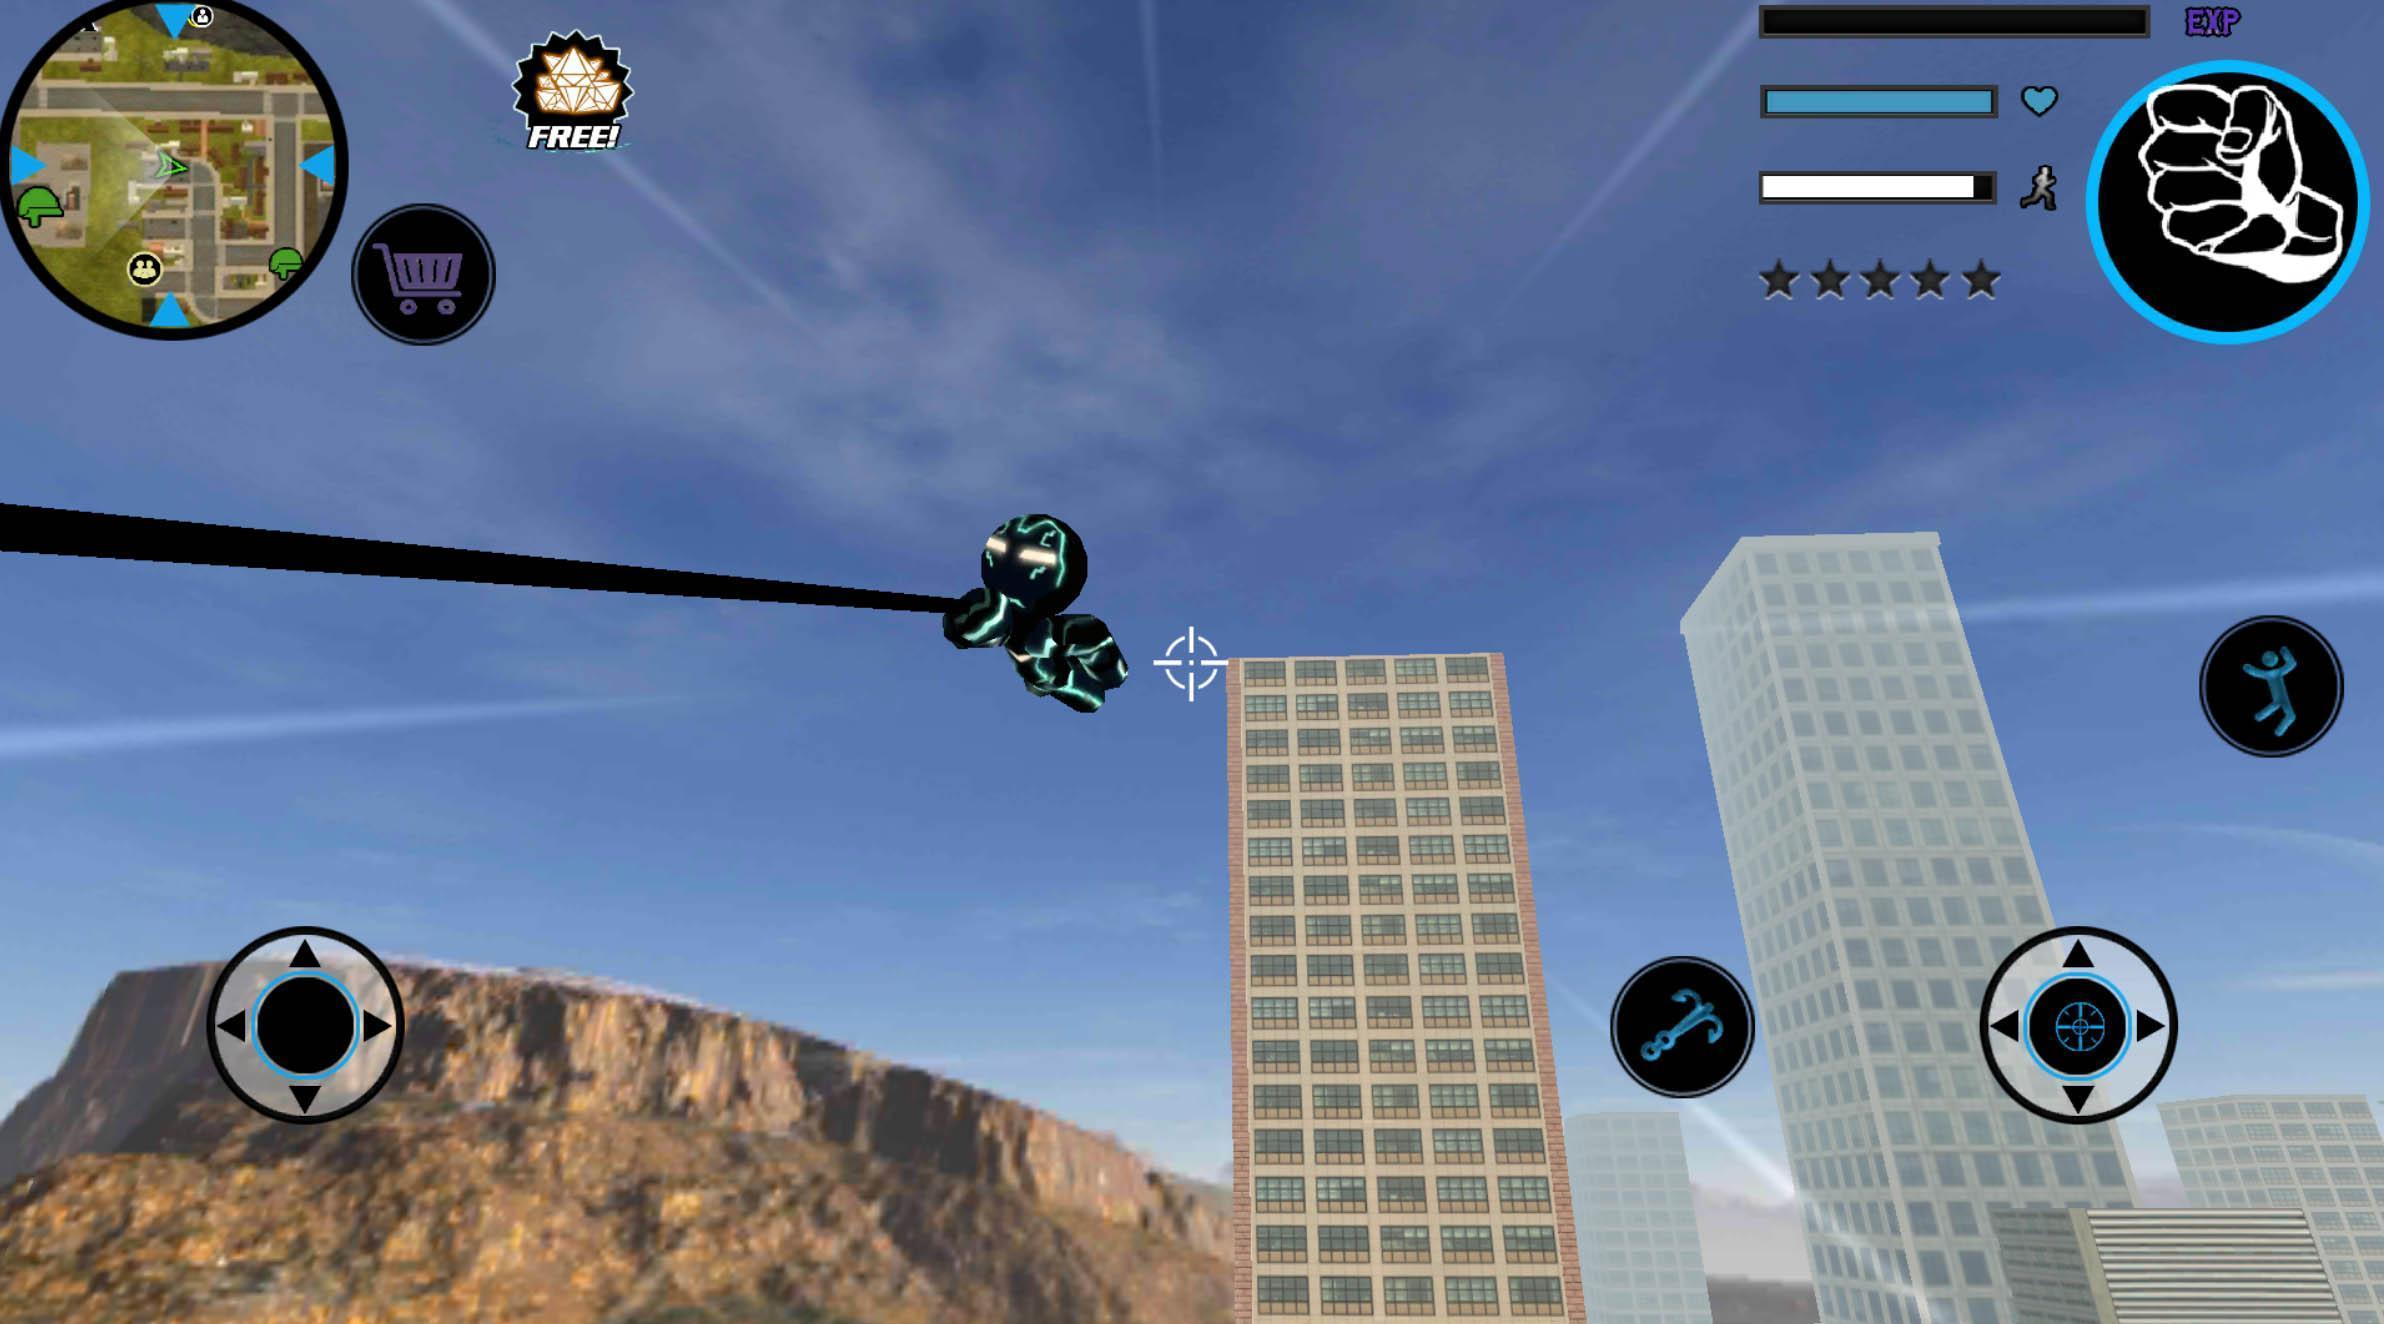 Neon Iron Stickman Rope Hero City Gangstar Mafia 1.6 Screenshot 3